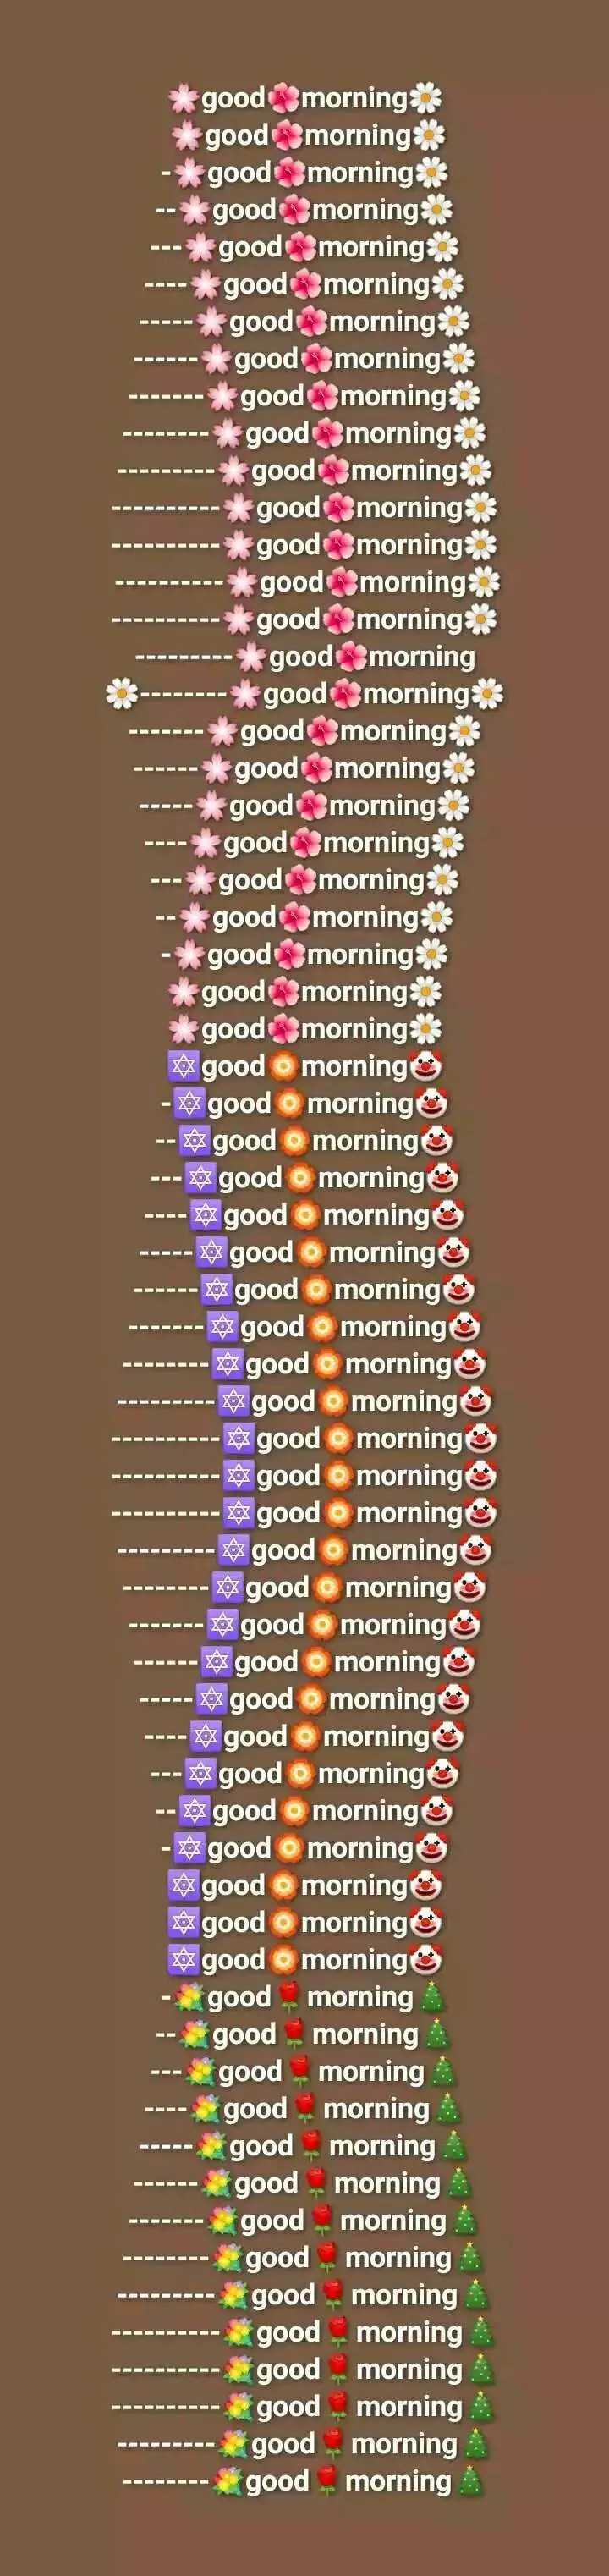 good morning - - - - - * good morning * good morning - * good morning 3 - - * good morning - - - * good morning 3 - - - - * good morning - - - - - * good morning 3 - - - - - - * good morning - - * good morning 3 - - - * good morning 3 - - - - - - - - - * good morning 3 * good morning * good morning 3 - - - good morning 3 - - - - - - - - - - * good morning : 3 - - - - - - - - - * good morning - - - - - - - - * good - morning - > - - - - - - - * good morning - - - - - - * good morning * good morning - - - - * good morning 3 - - - * good morning 3 - - * good morning 3 - * good morning 3 * good morning * good morning ☆ good morning - good morning ☆ good morning - - - good morning good morning x good morning good o morning good morning good morning ☆ good morning - good morning good morning good morning good morning o good morning good morning o good morning good morning - good morning - - - good morning - - o good morning ☆ good morning good morning good morning x good morning - good morning , - - good morning - - - good morning - - - - good morning - - - - - good morning good morning - - - - - - - good morning - - good morning - - - good morning - - - good morning - - - good morning good morning - - - - - - - - - good morning good morning - ShareChat